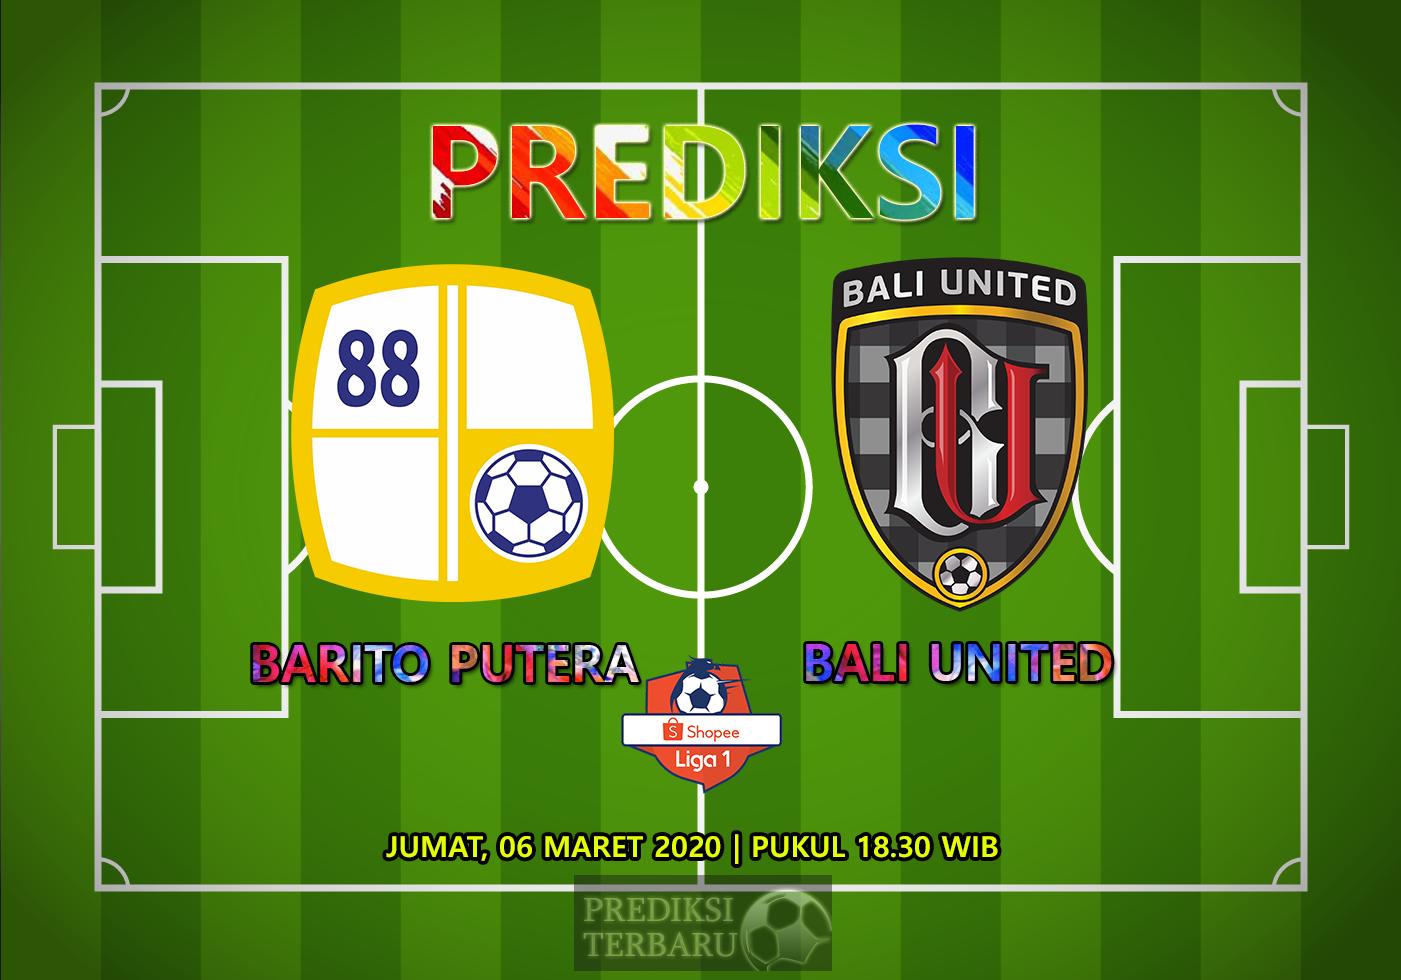 Prediksi Barito Putera Vs Bali United Jumat 06 Maret